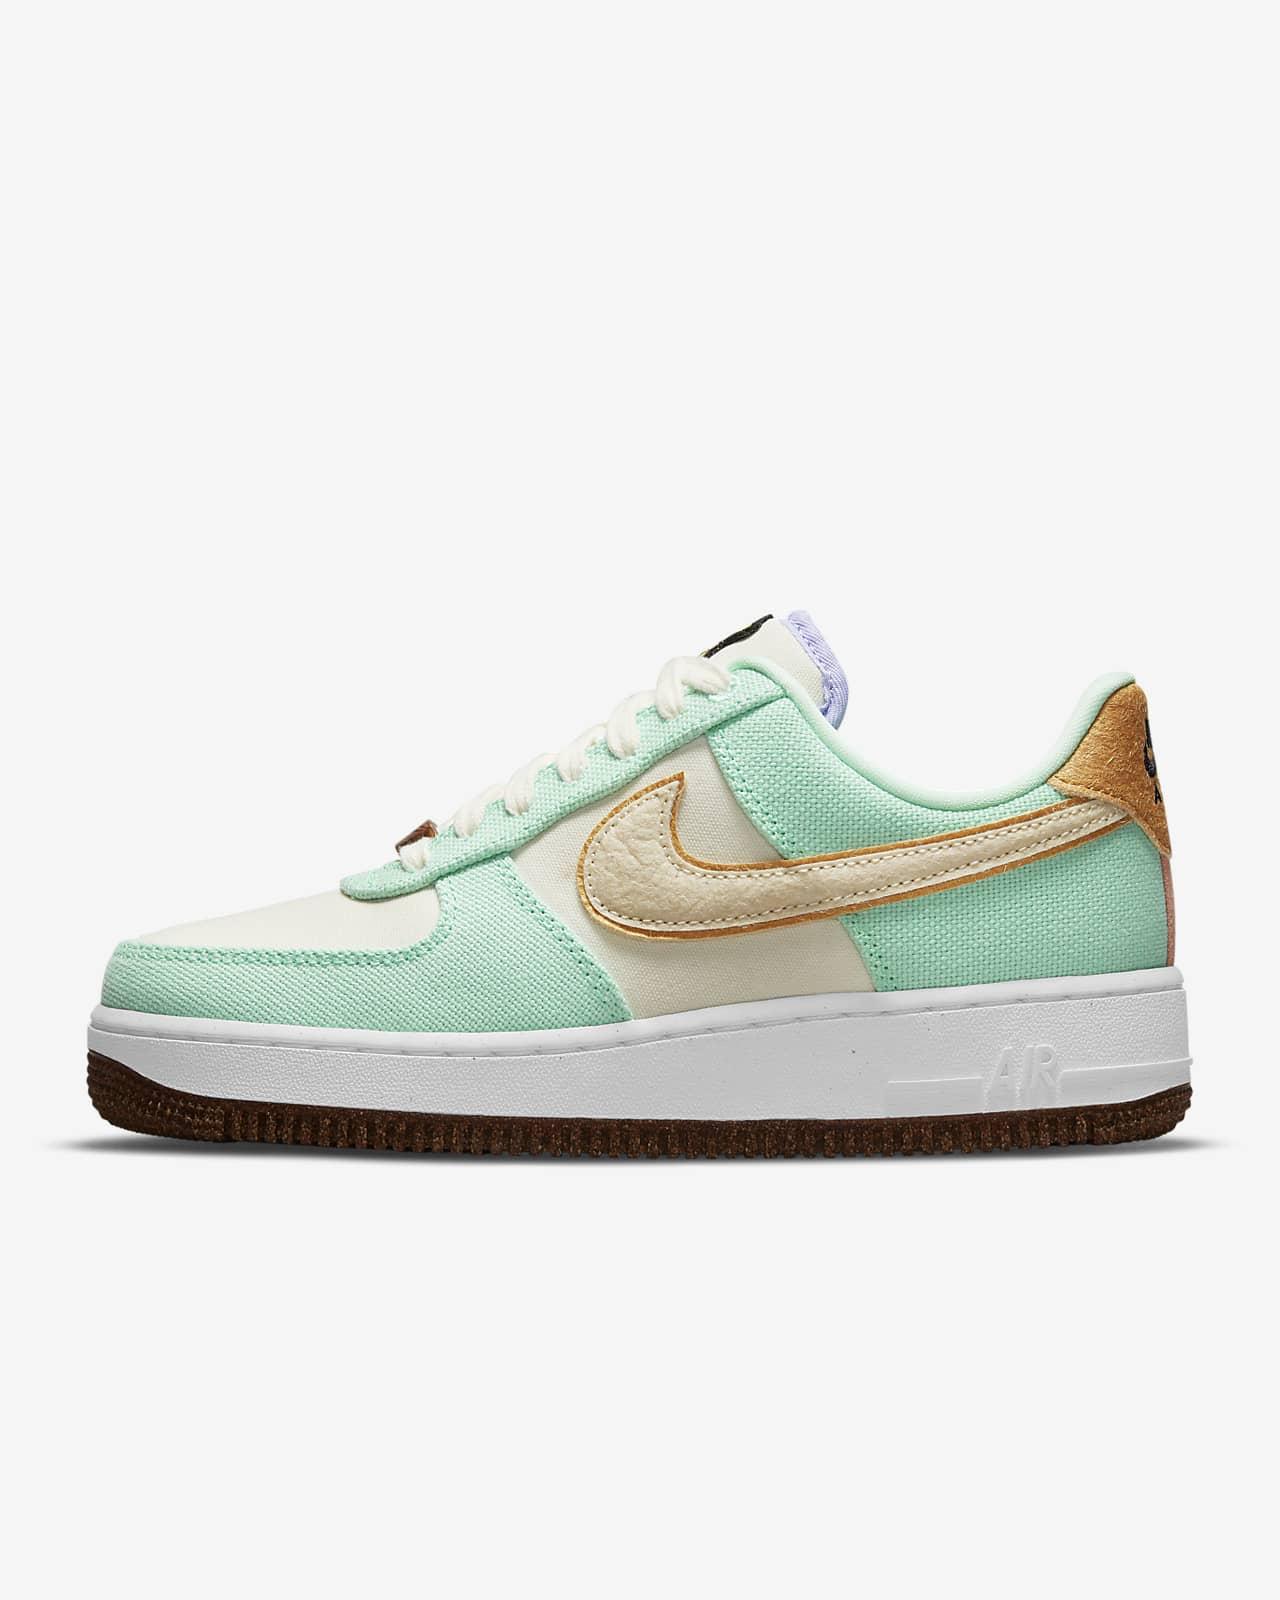 Nike Air Force 1 '07 LX Damenschuh